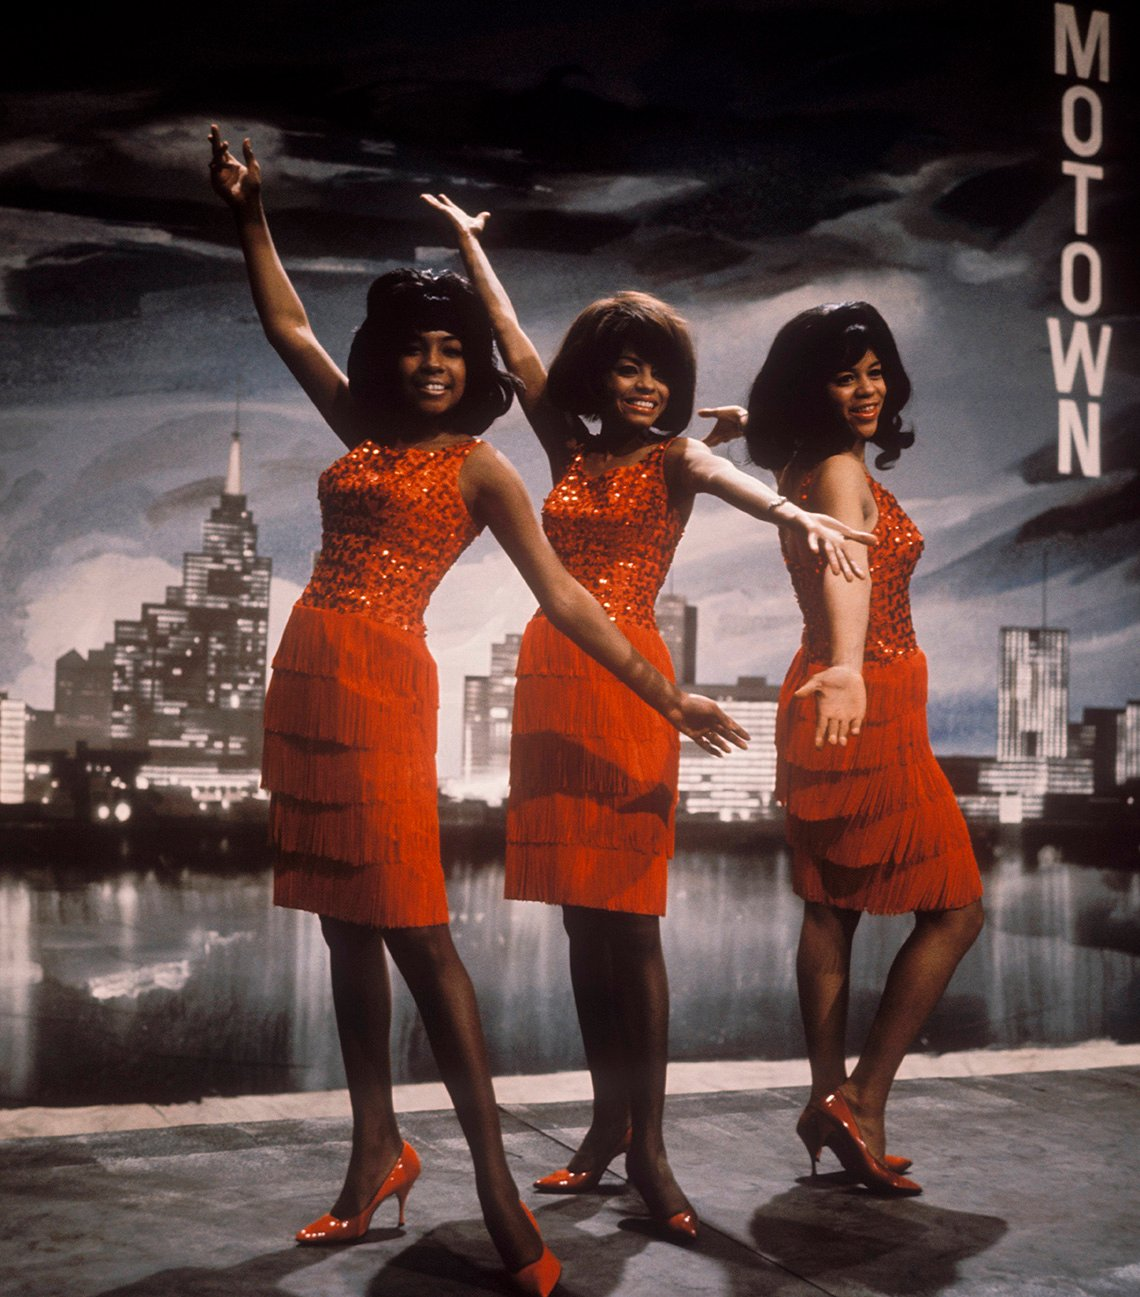 Presentación de la agrupación de Motown, The Supremes